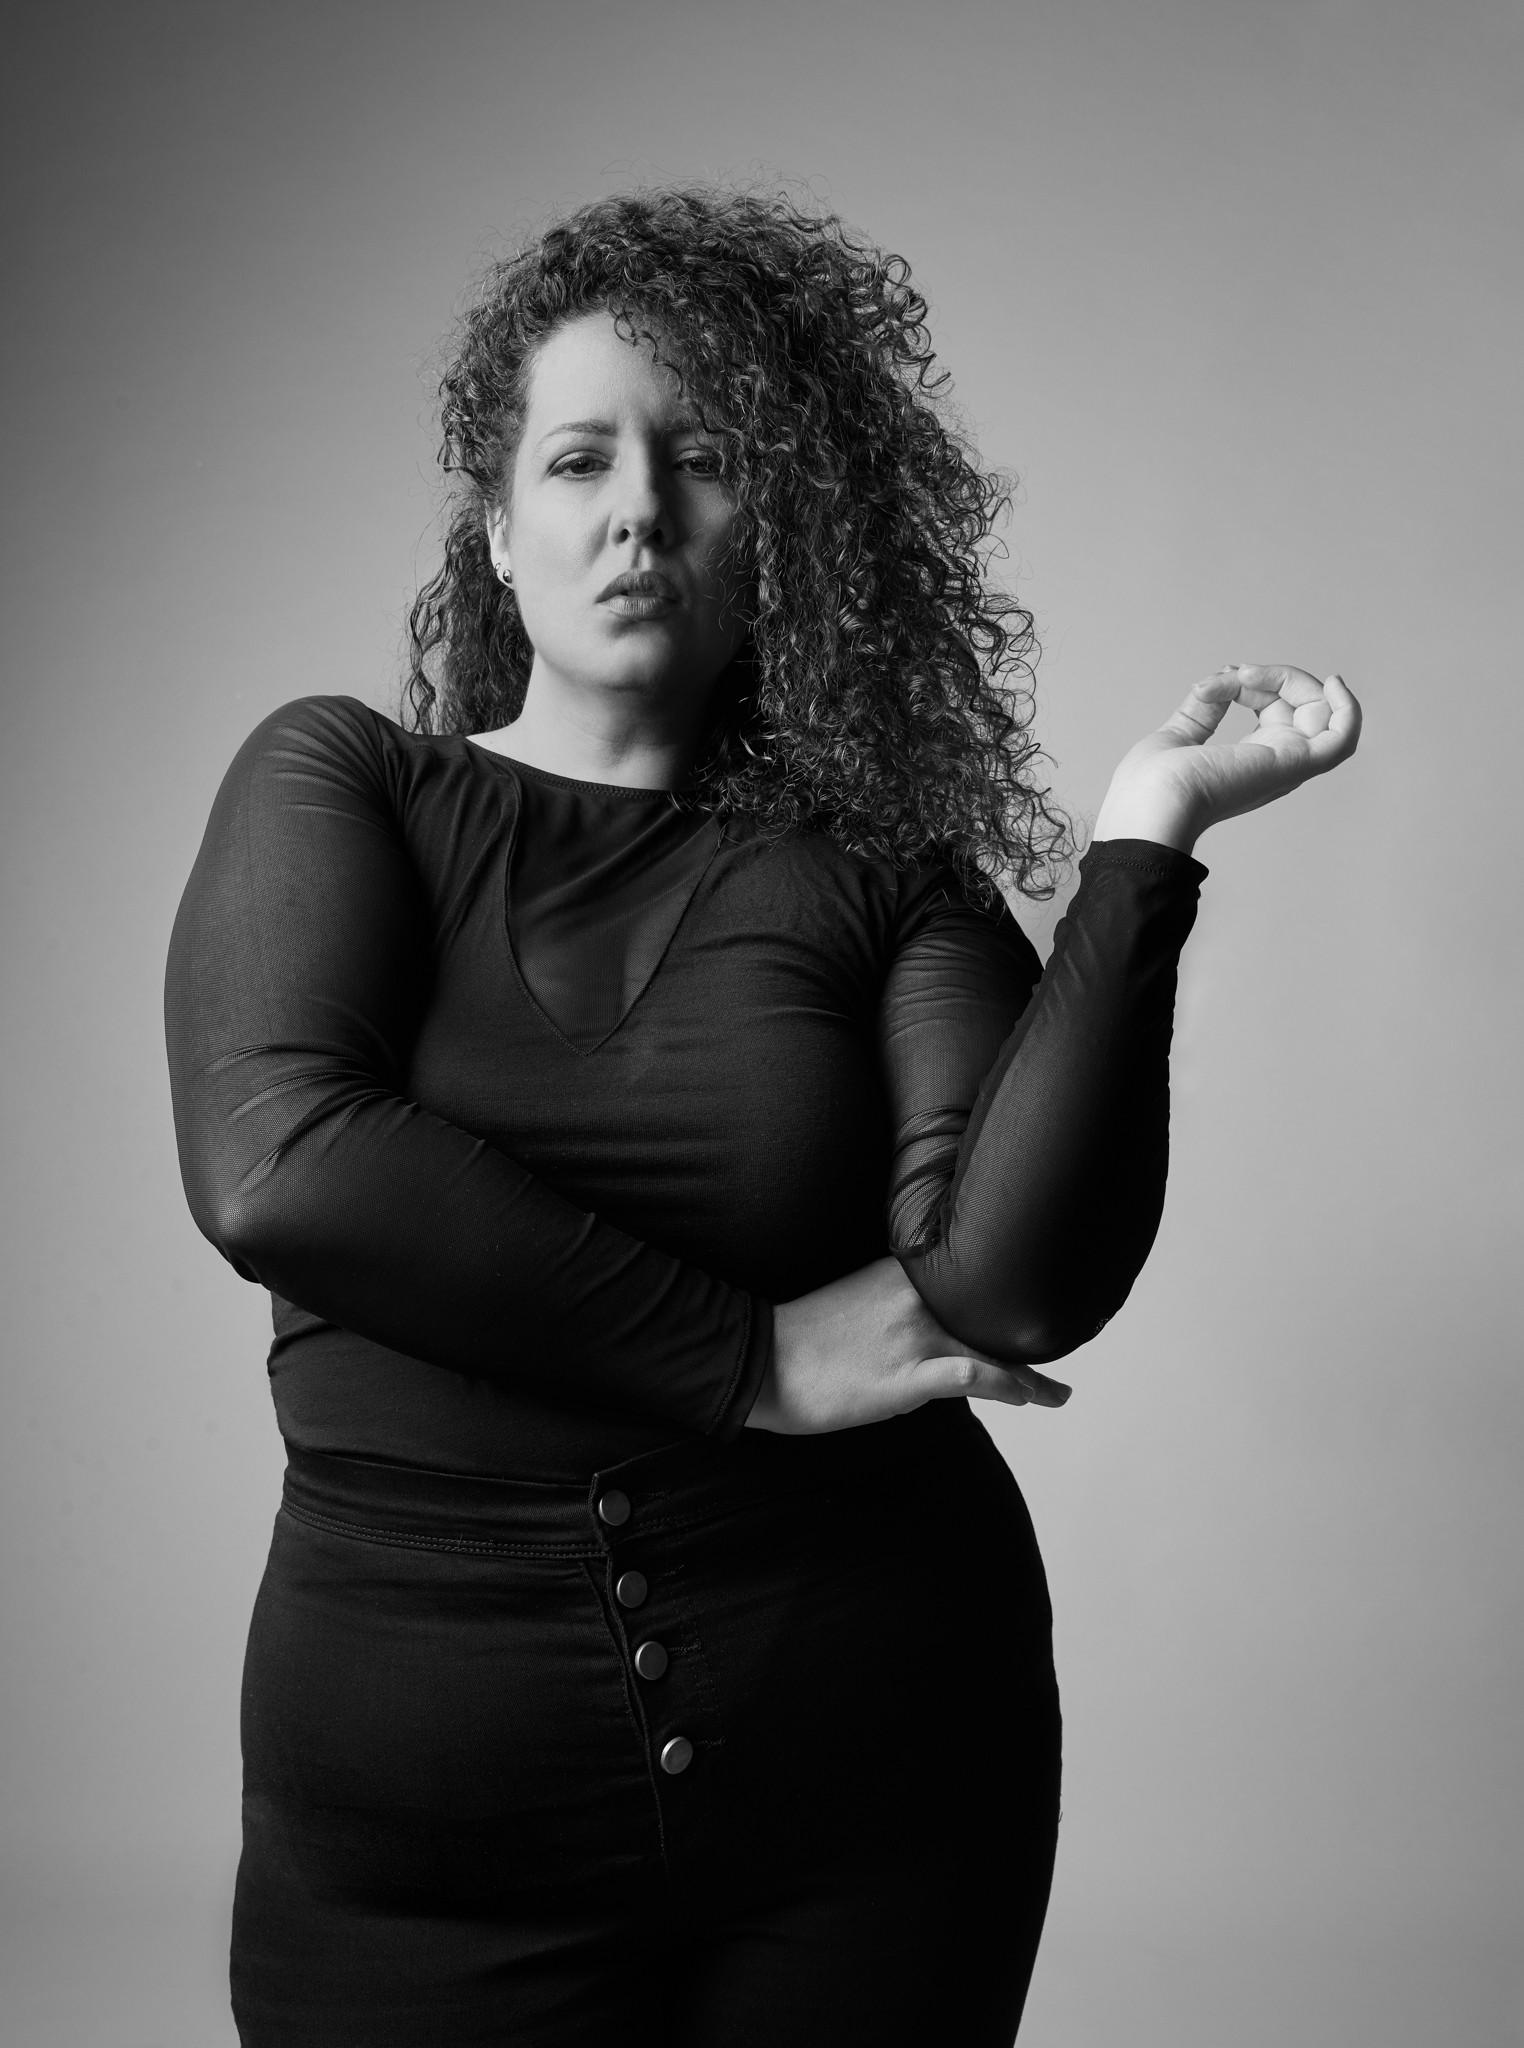 naline-zwart-wit-mode-fotografie-mollige-vrouw-jan-kruize